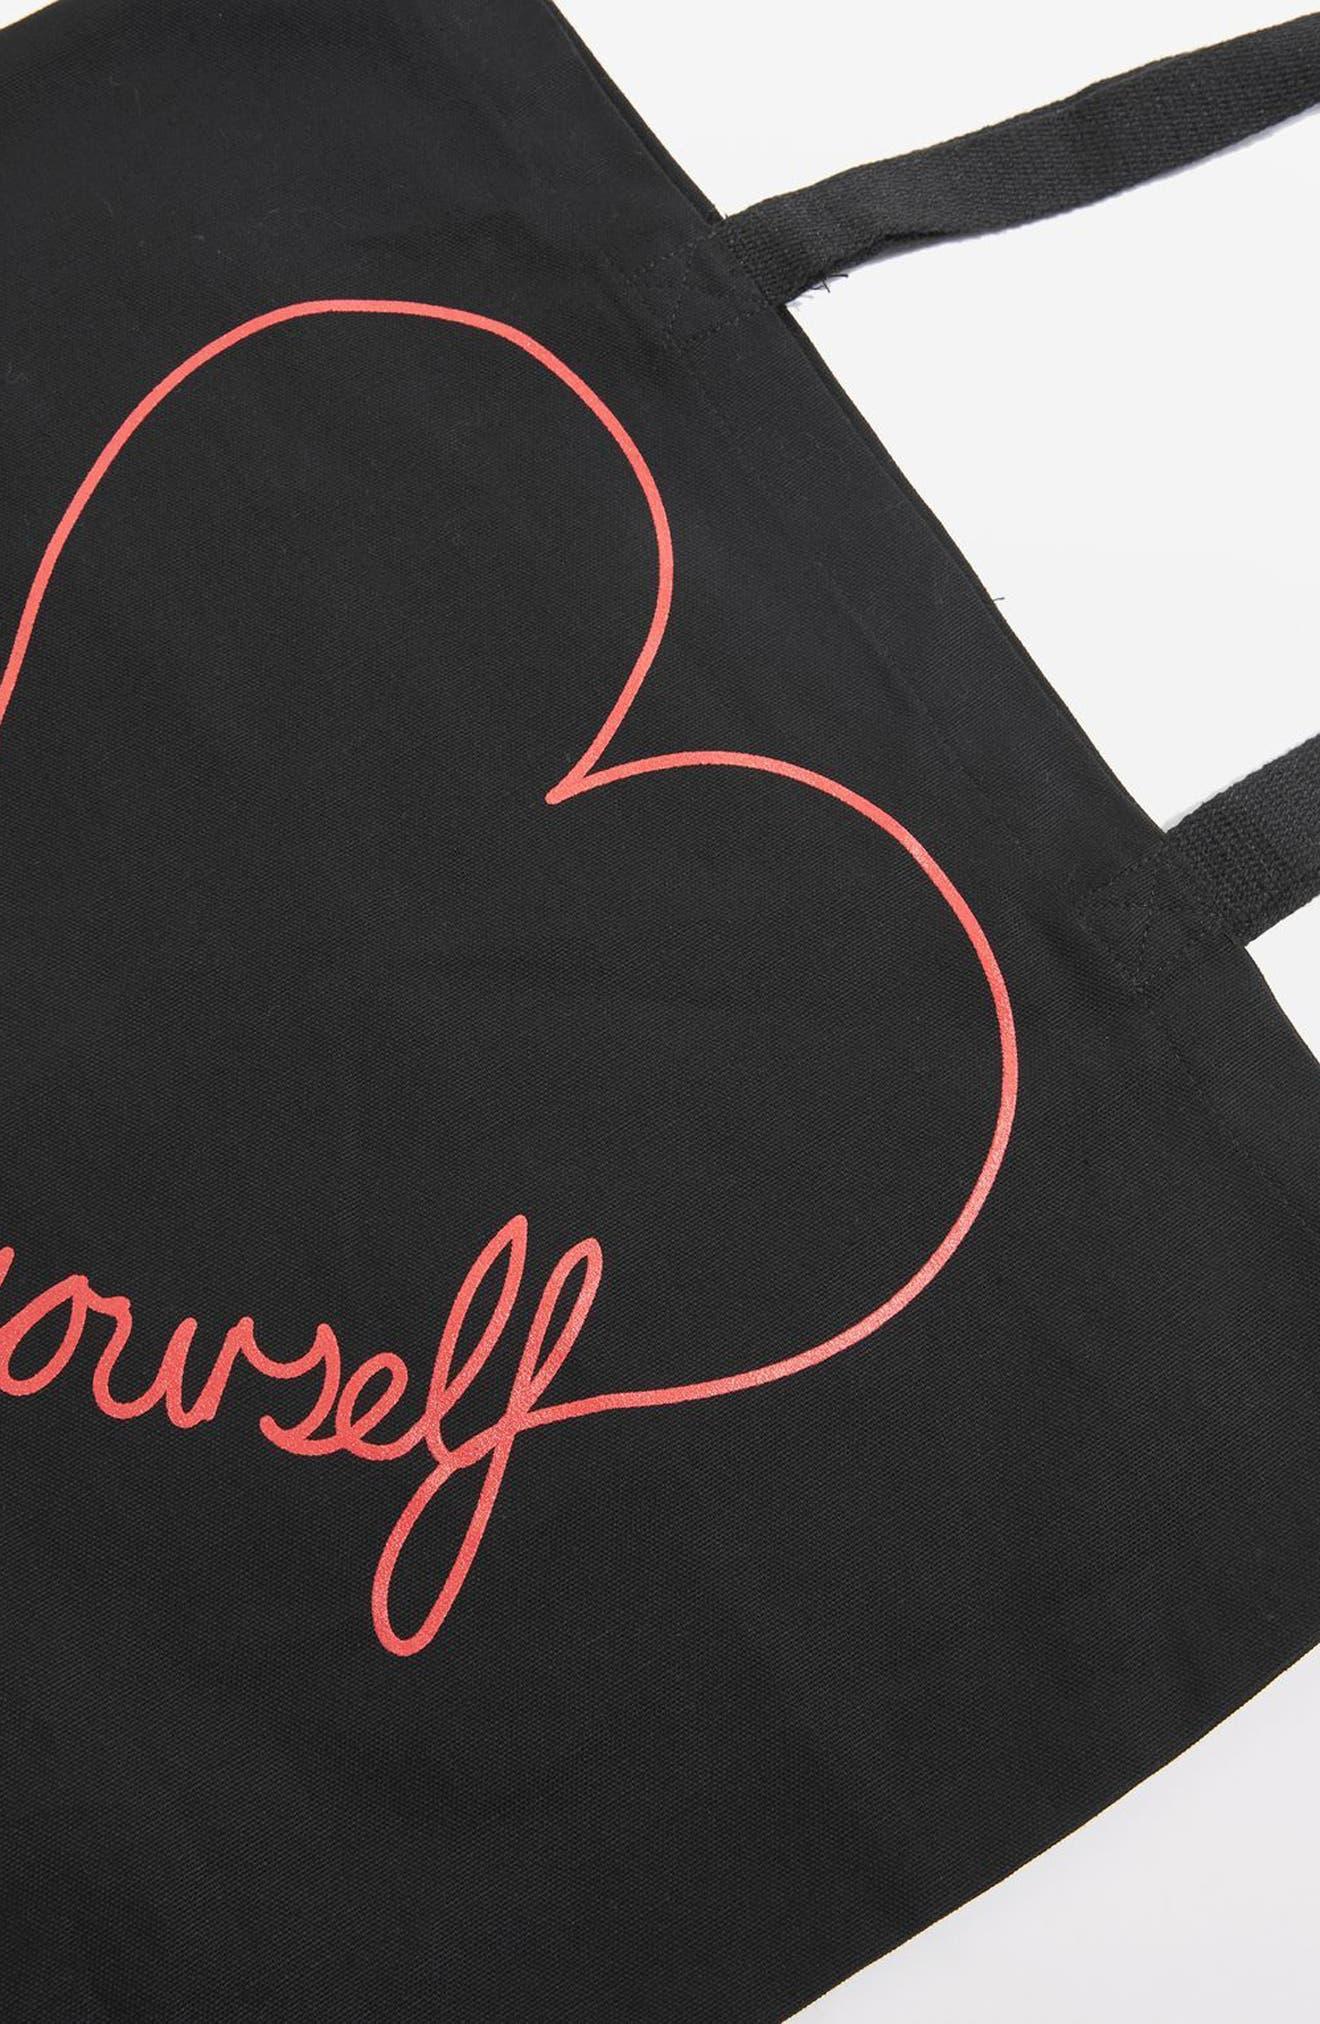 Love Yourself Canvas Tote Bag,                             Alternate thumbnail 4, color,                             Black Multi